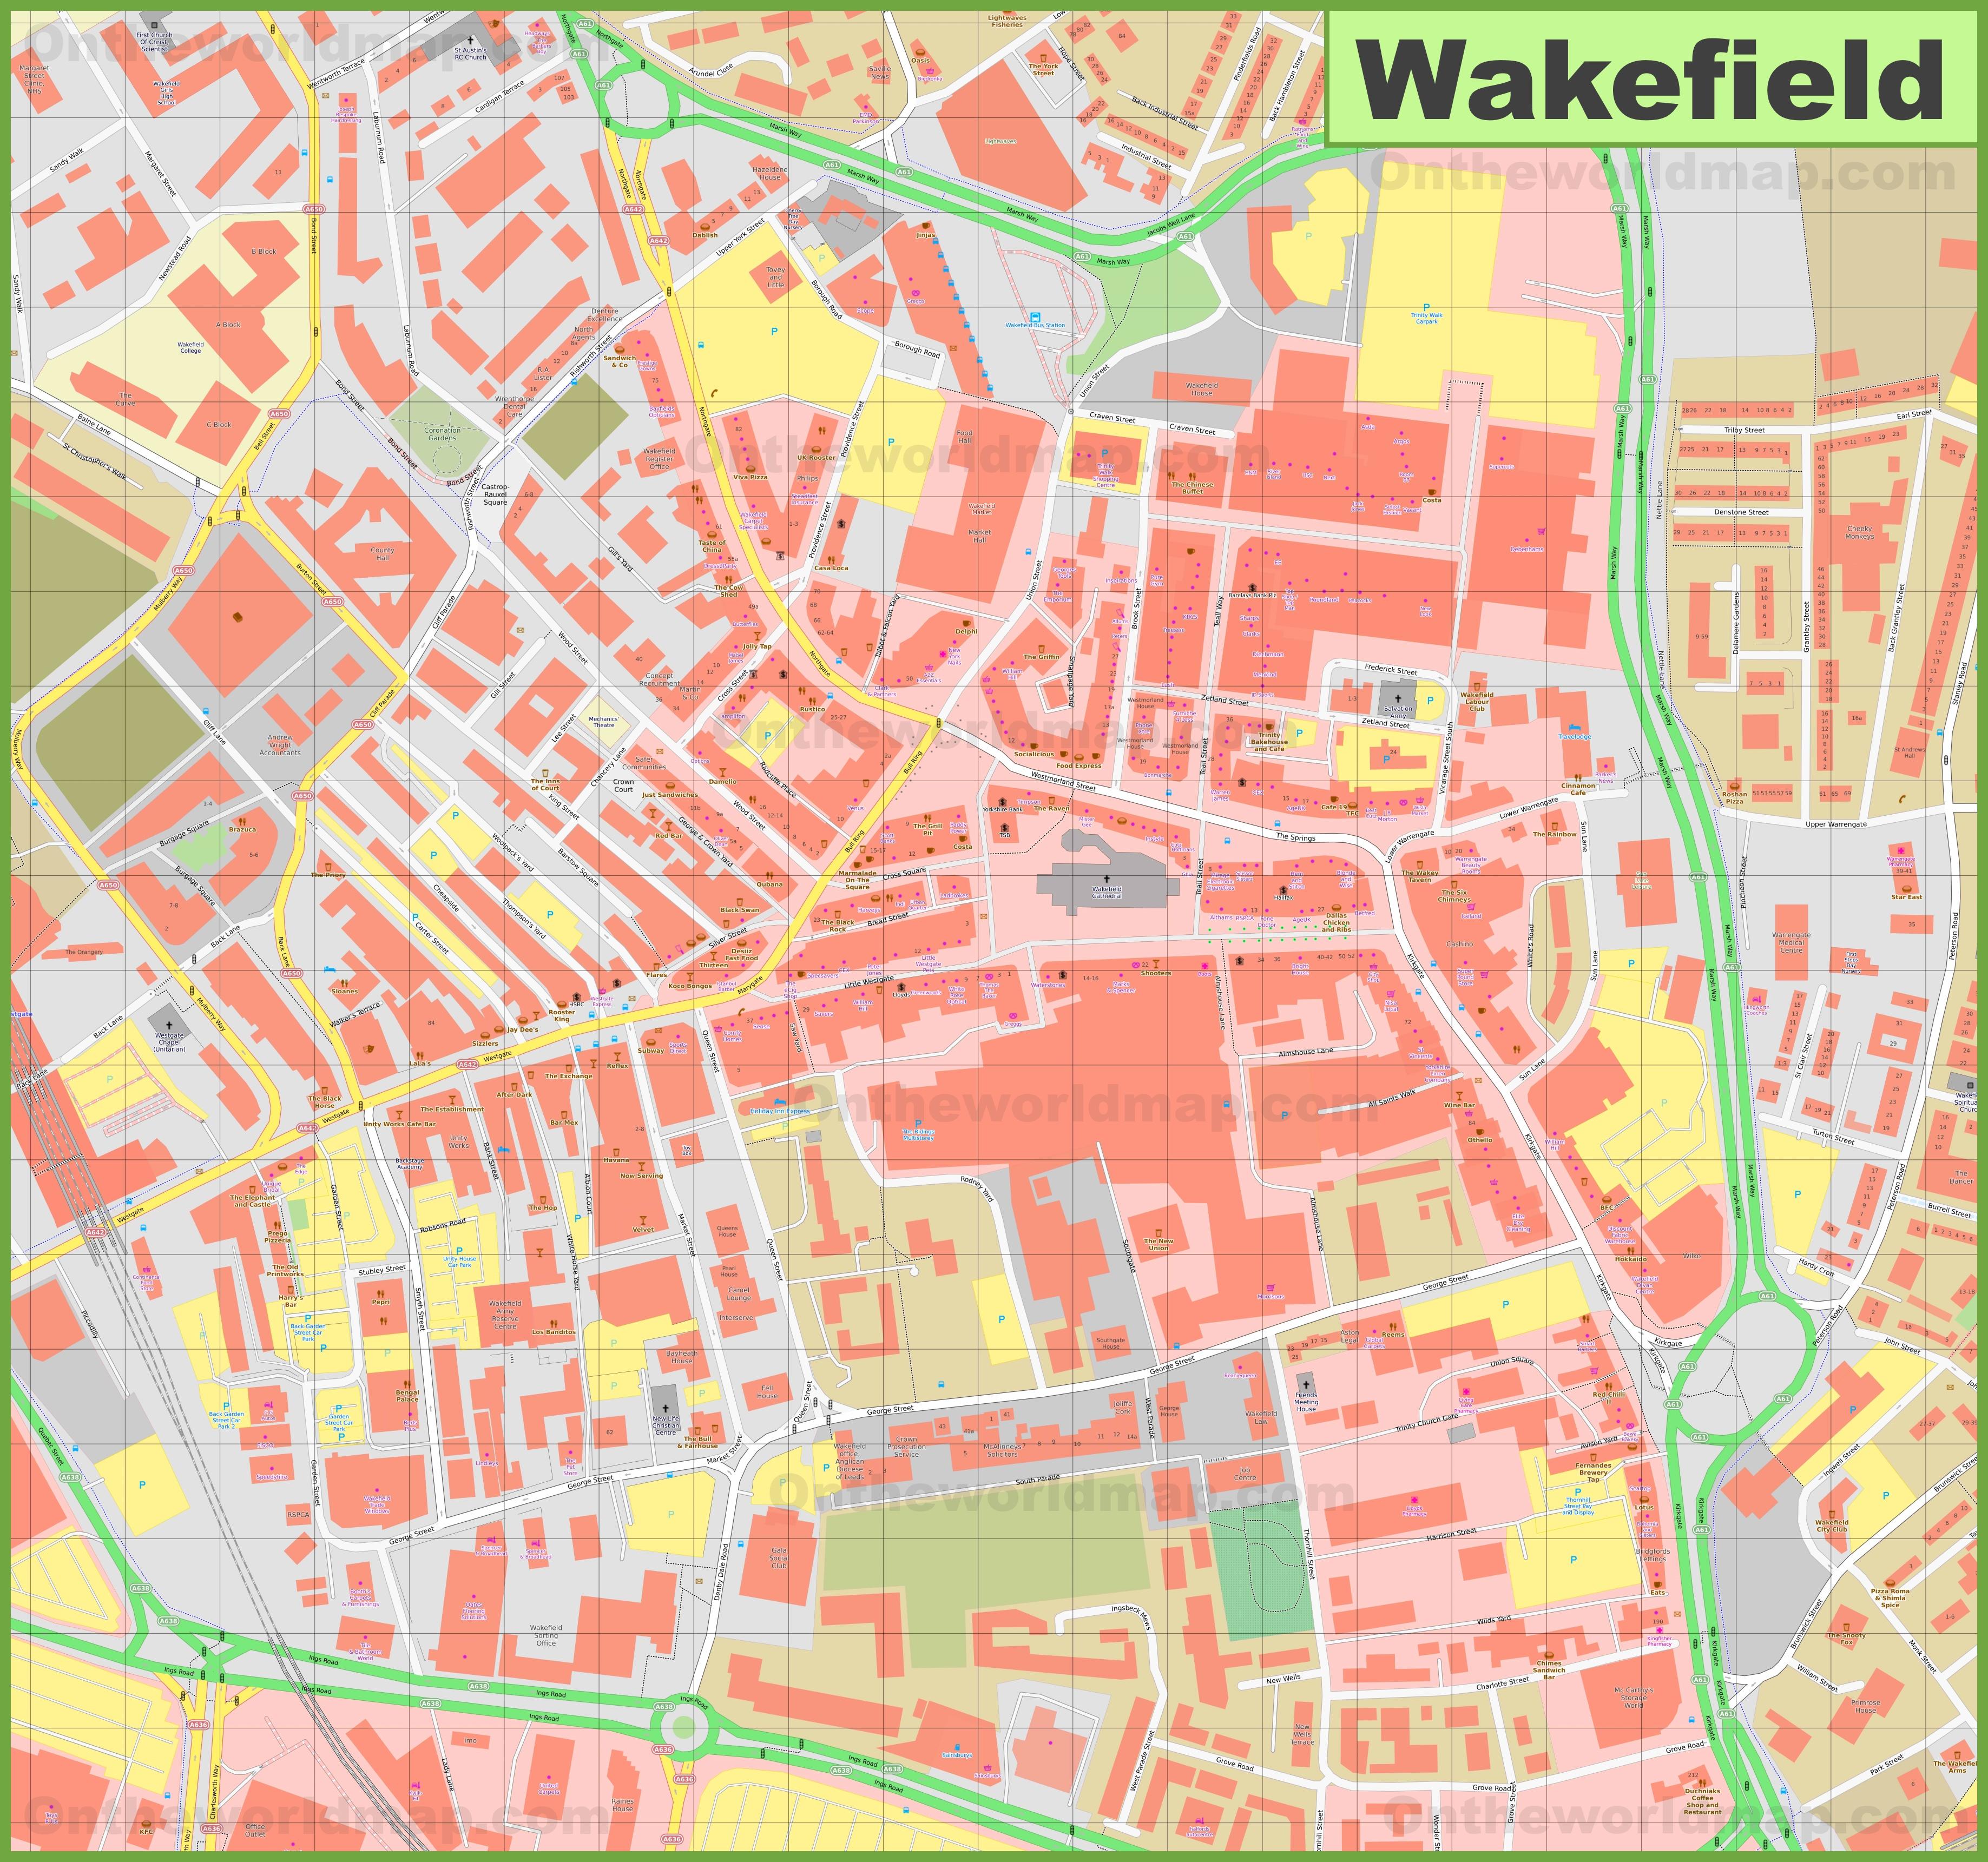 Wakefield Maps UK Maps of Wakefield